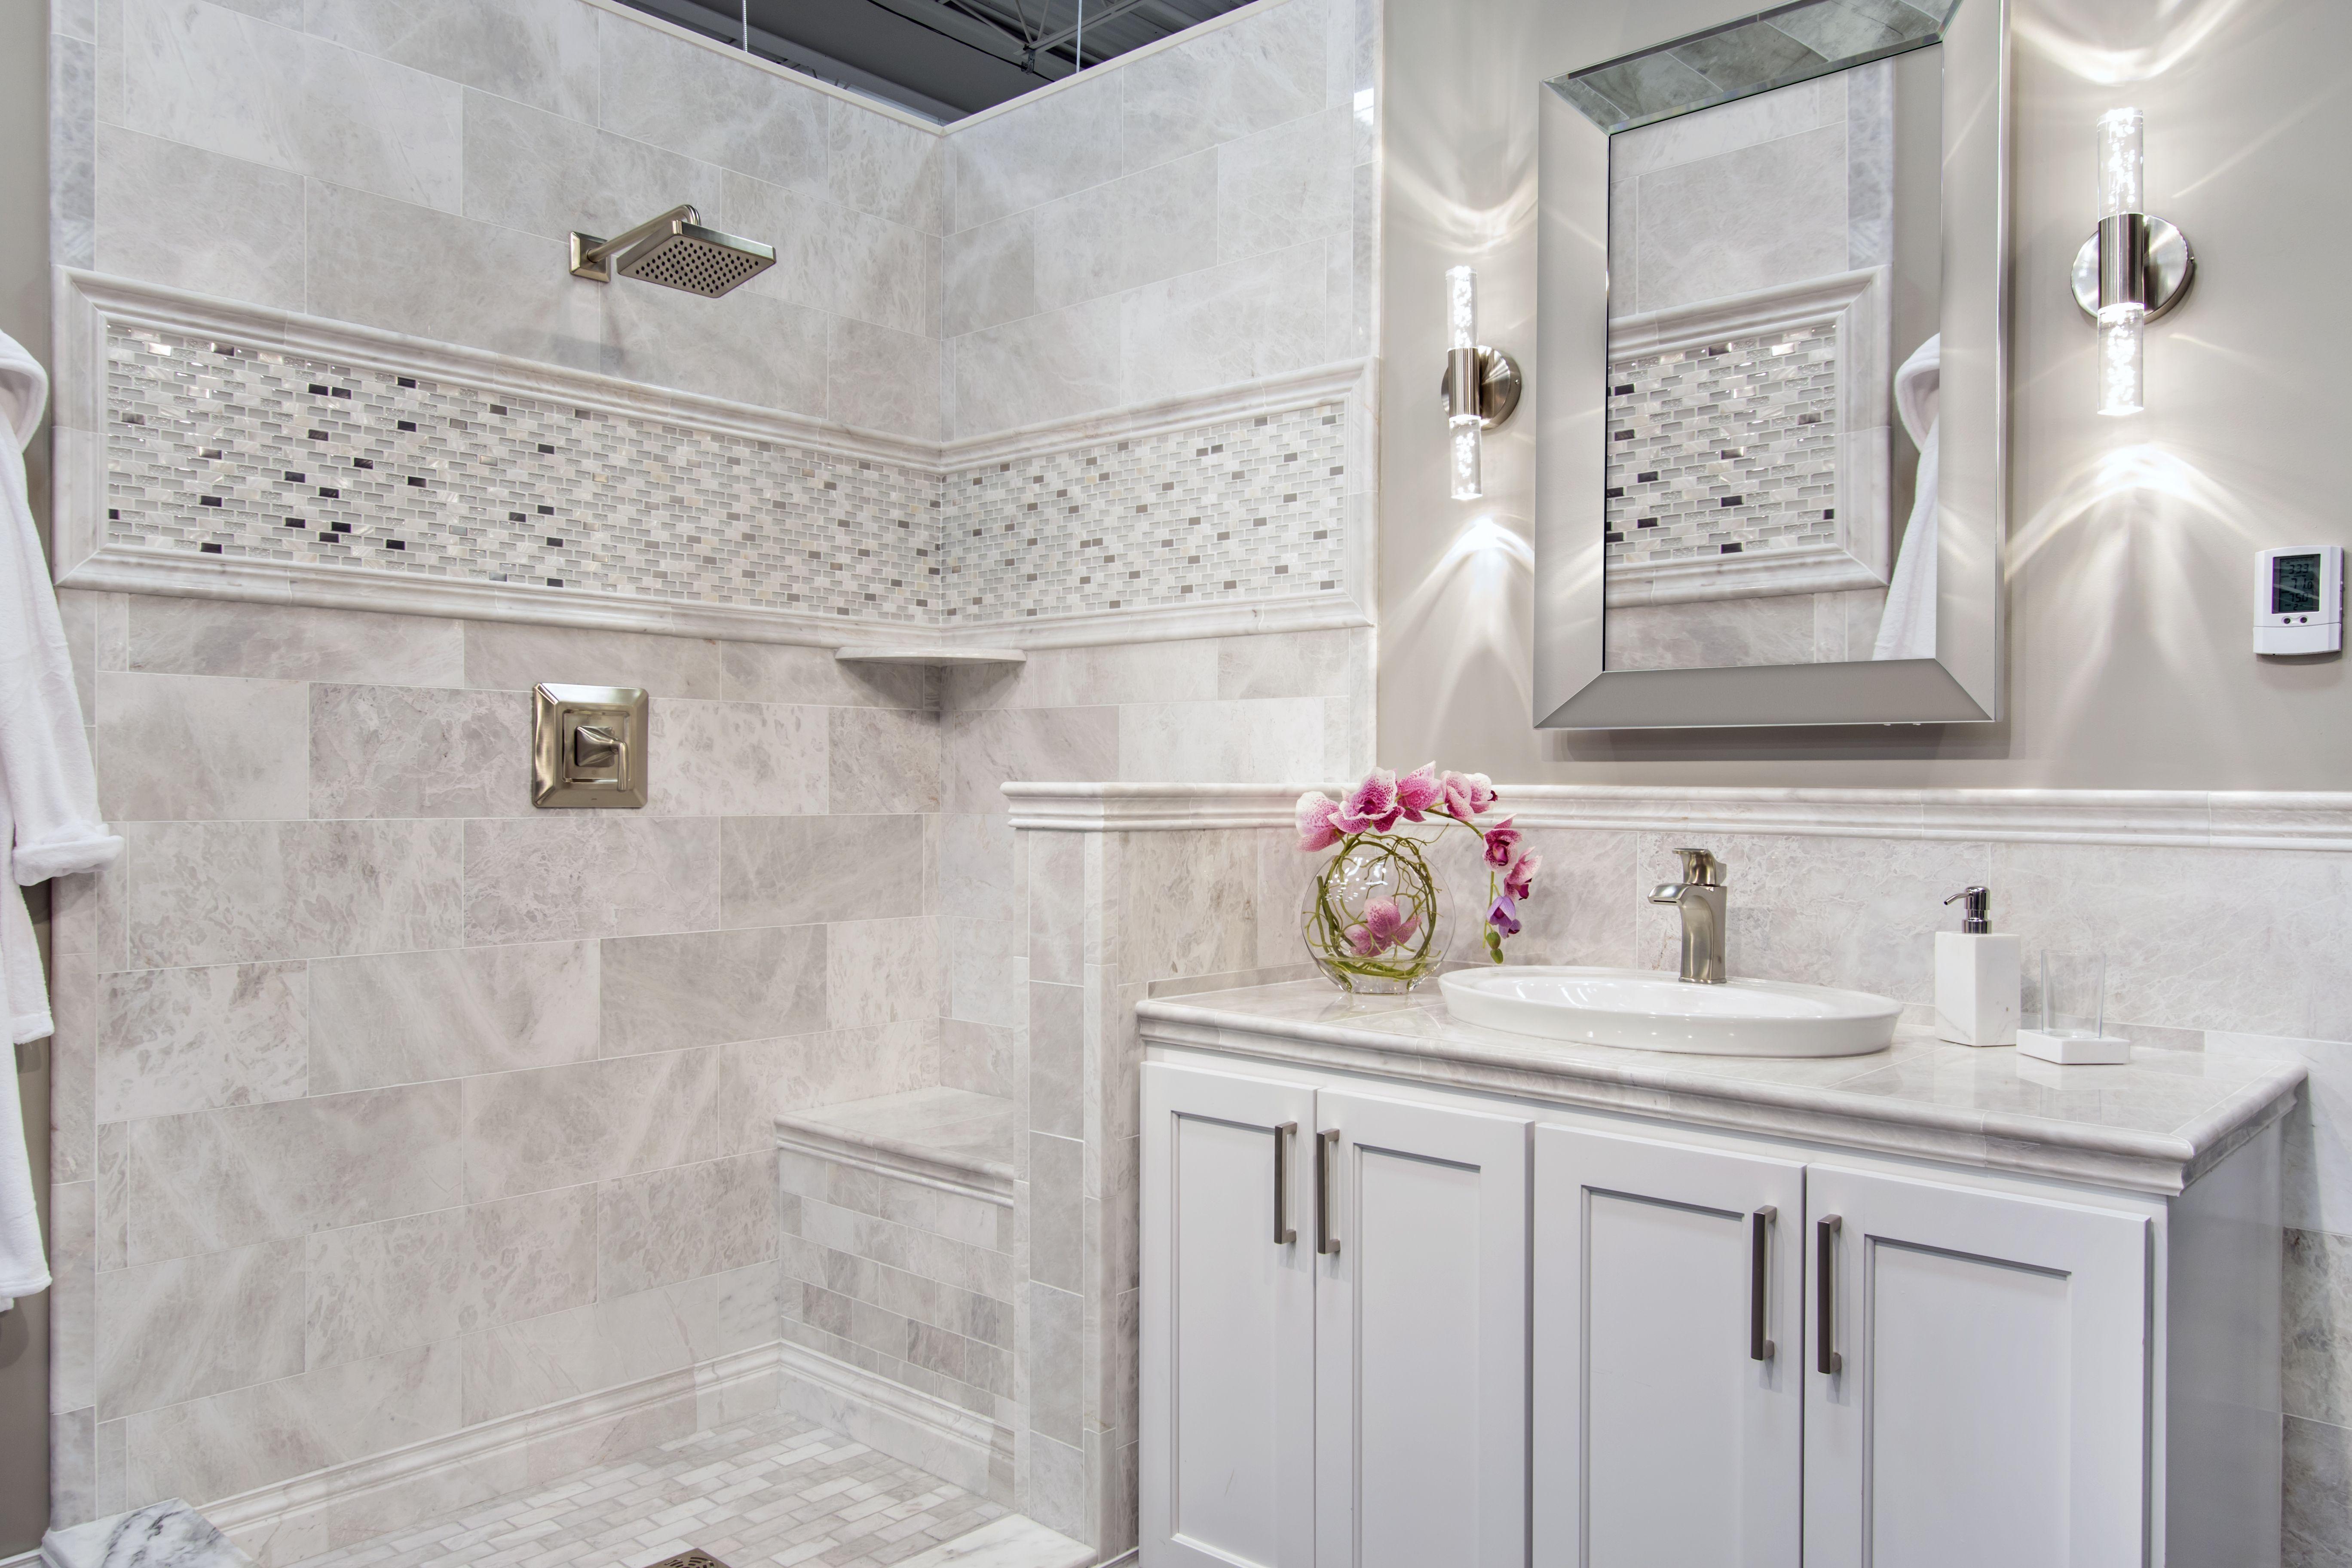 49 elegant marble tile design ideas for your fireplace bedroom rh pinterest com